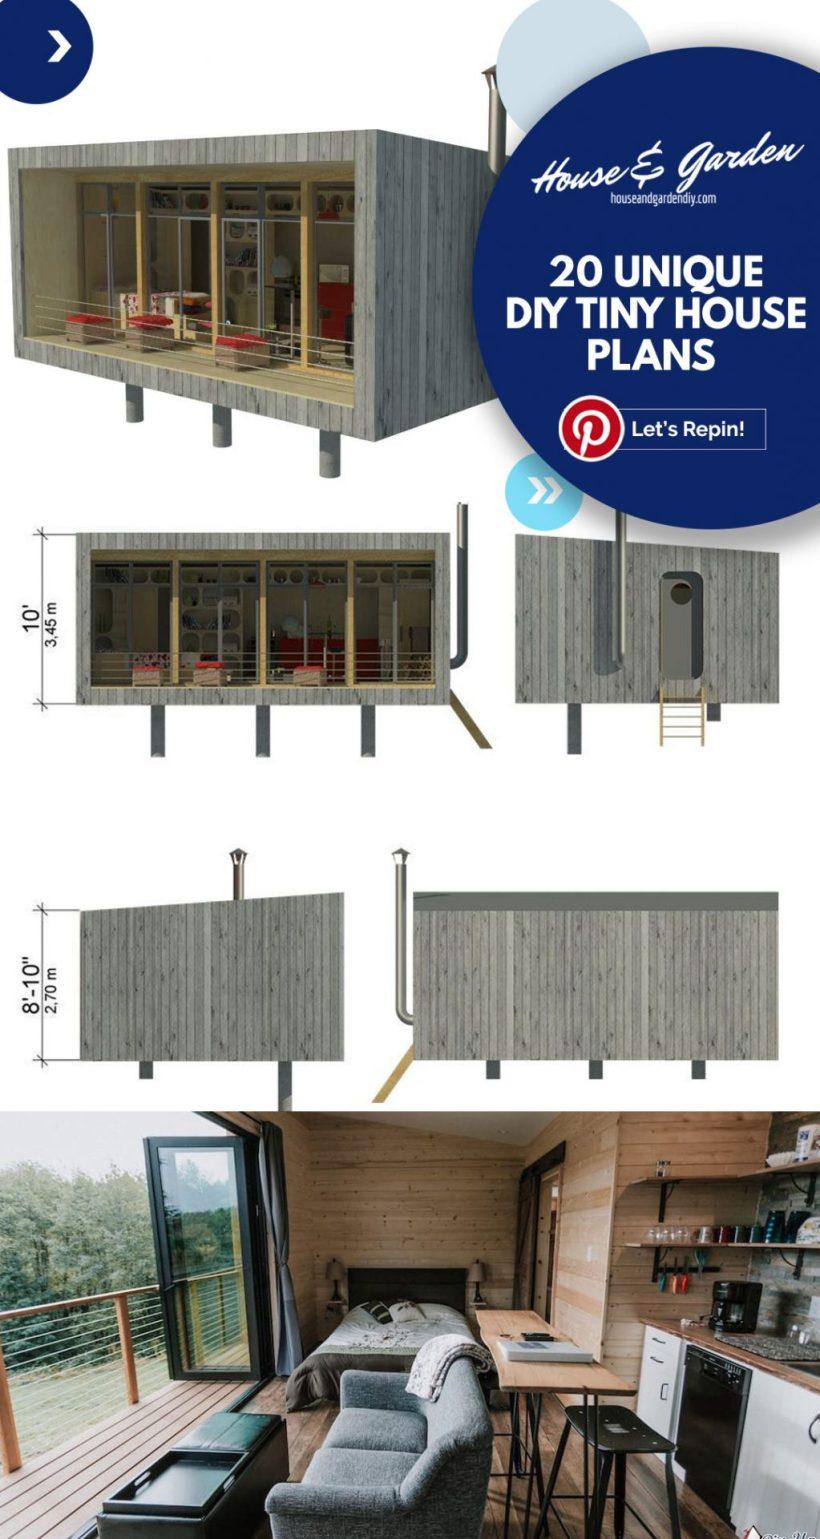 800 sq ft house plans 2 bedroom 2 bath